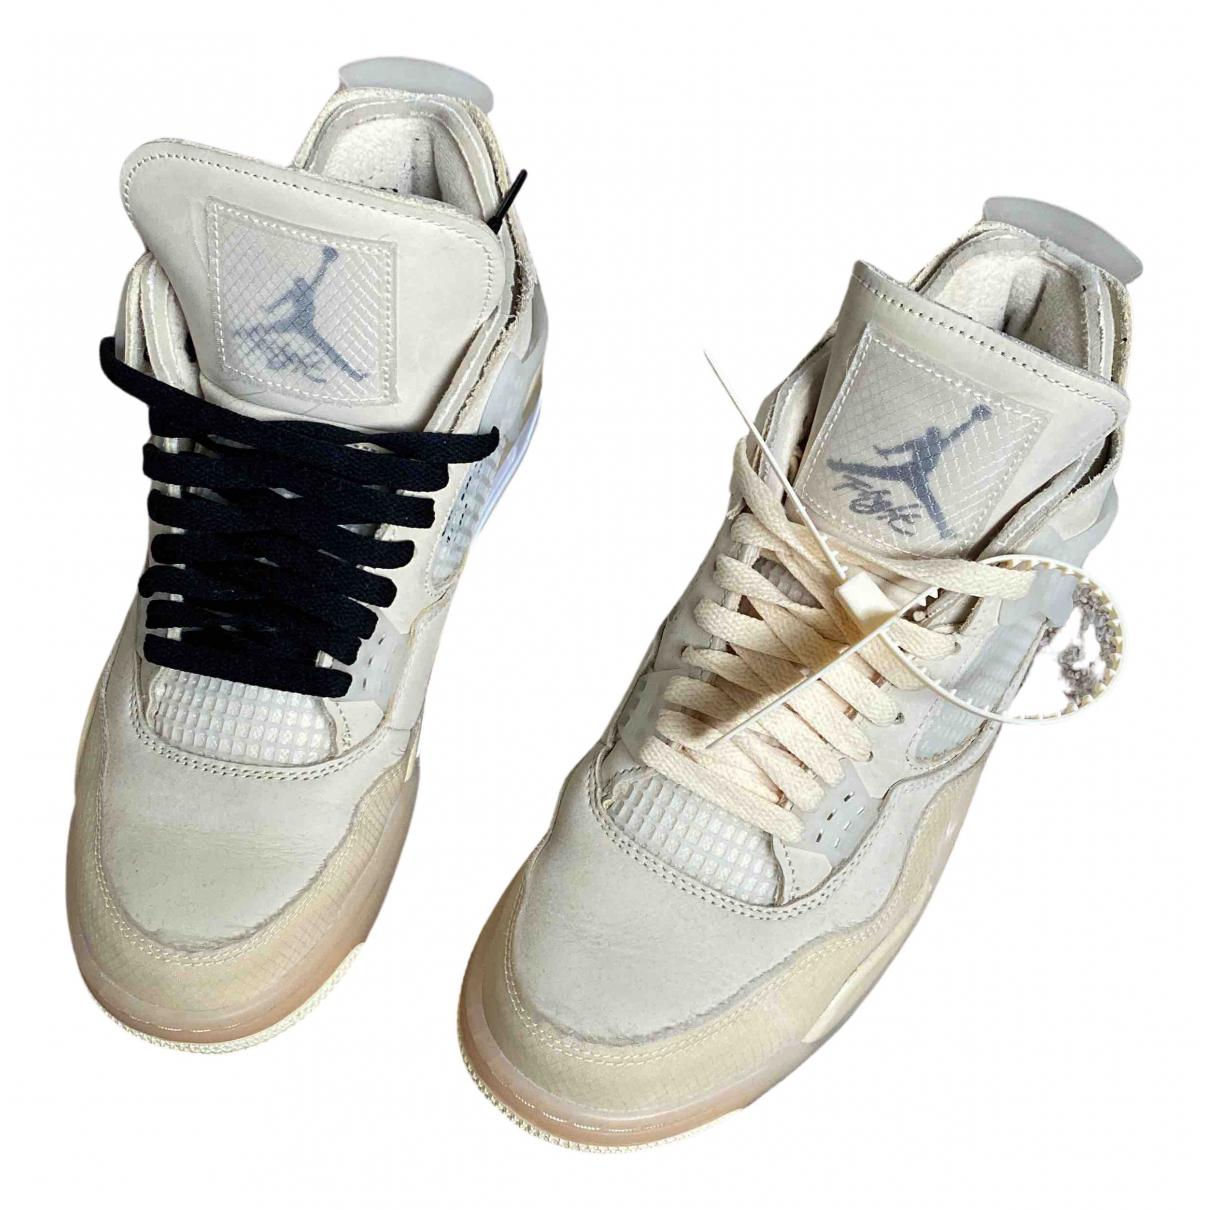 Deportivas Air Jordan 4 de Cuero Nike X Off-white